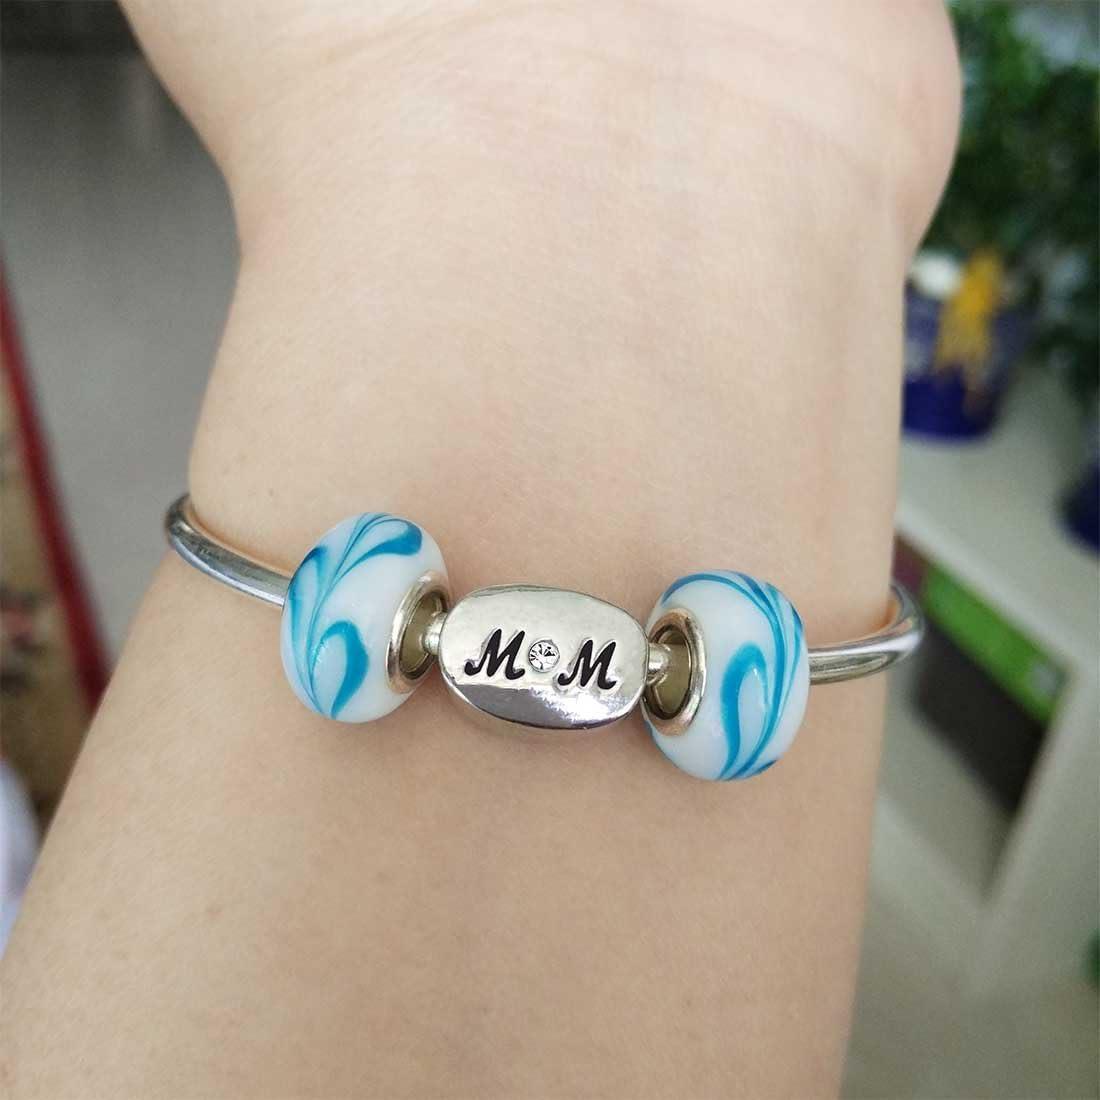 MOM Bead Charm Bracelets April Birthstone GiftJewelryShop Silver Plated Birthday Cat Photo White Crystal